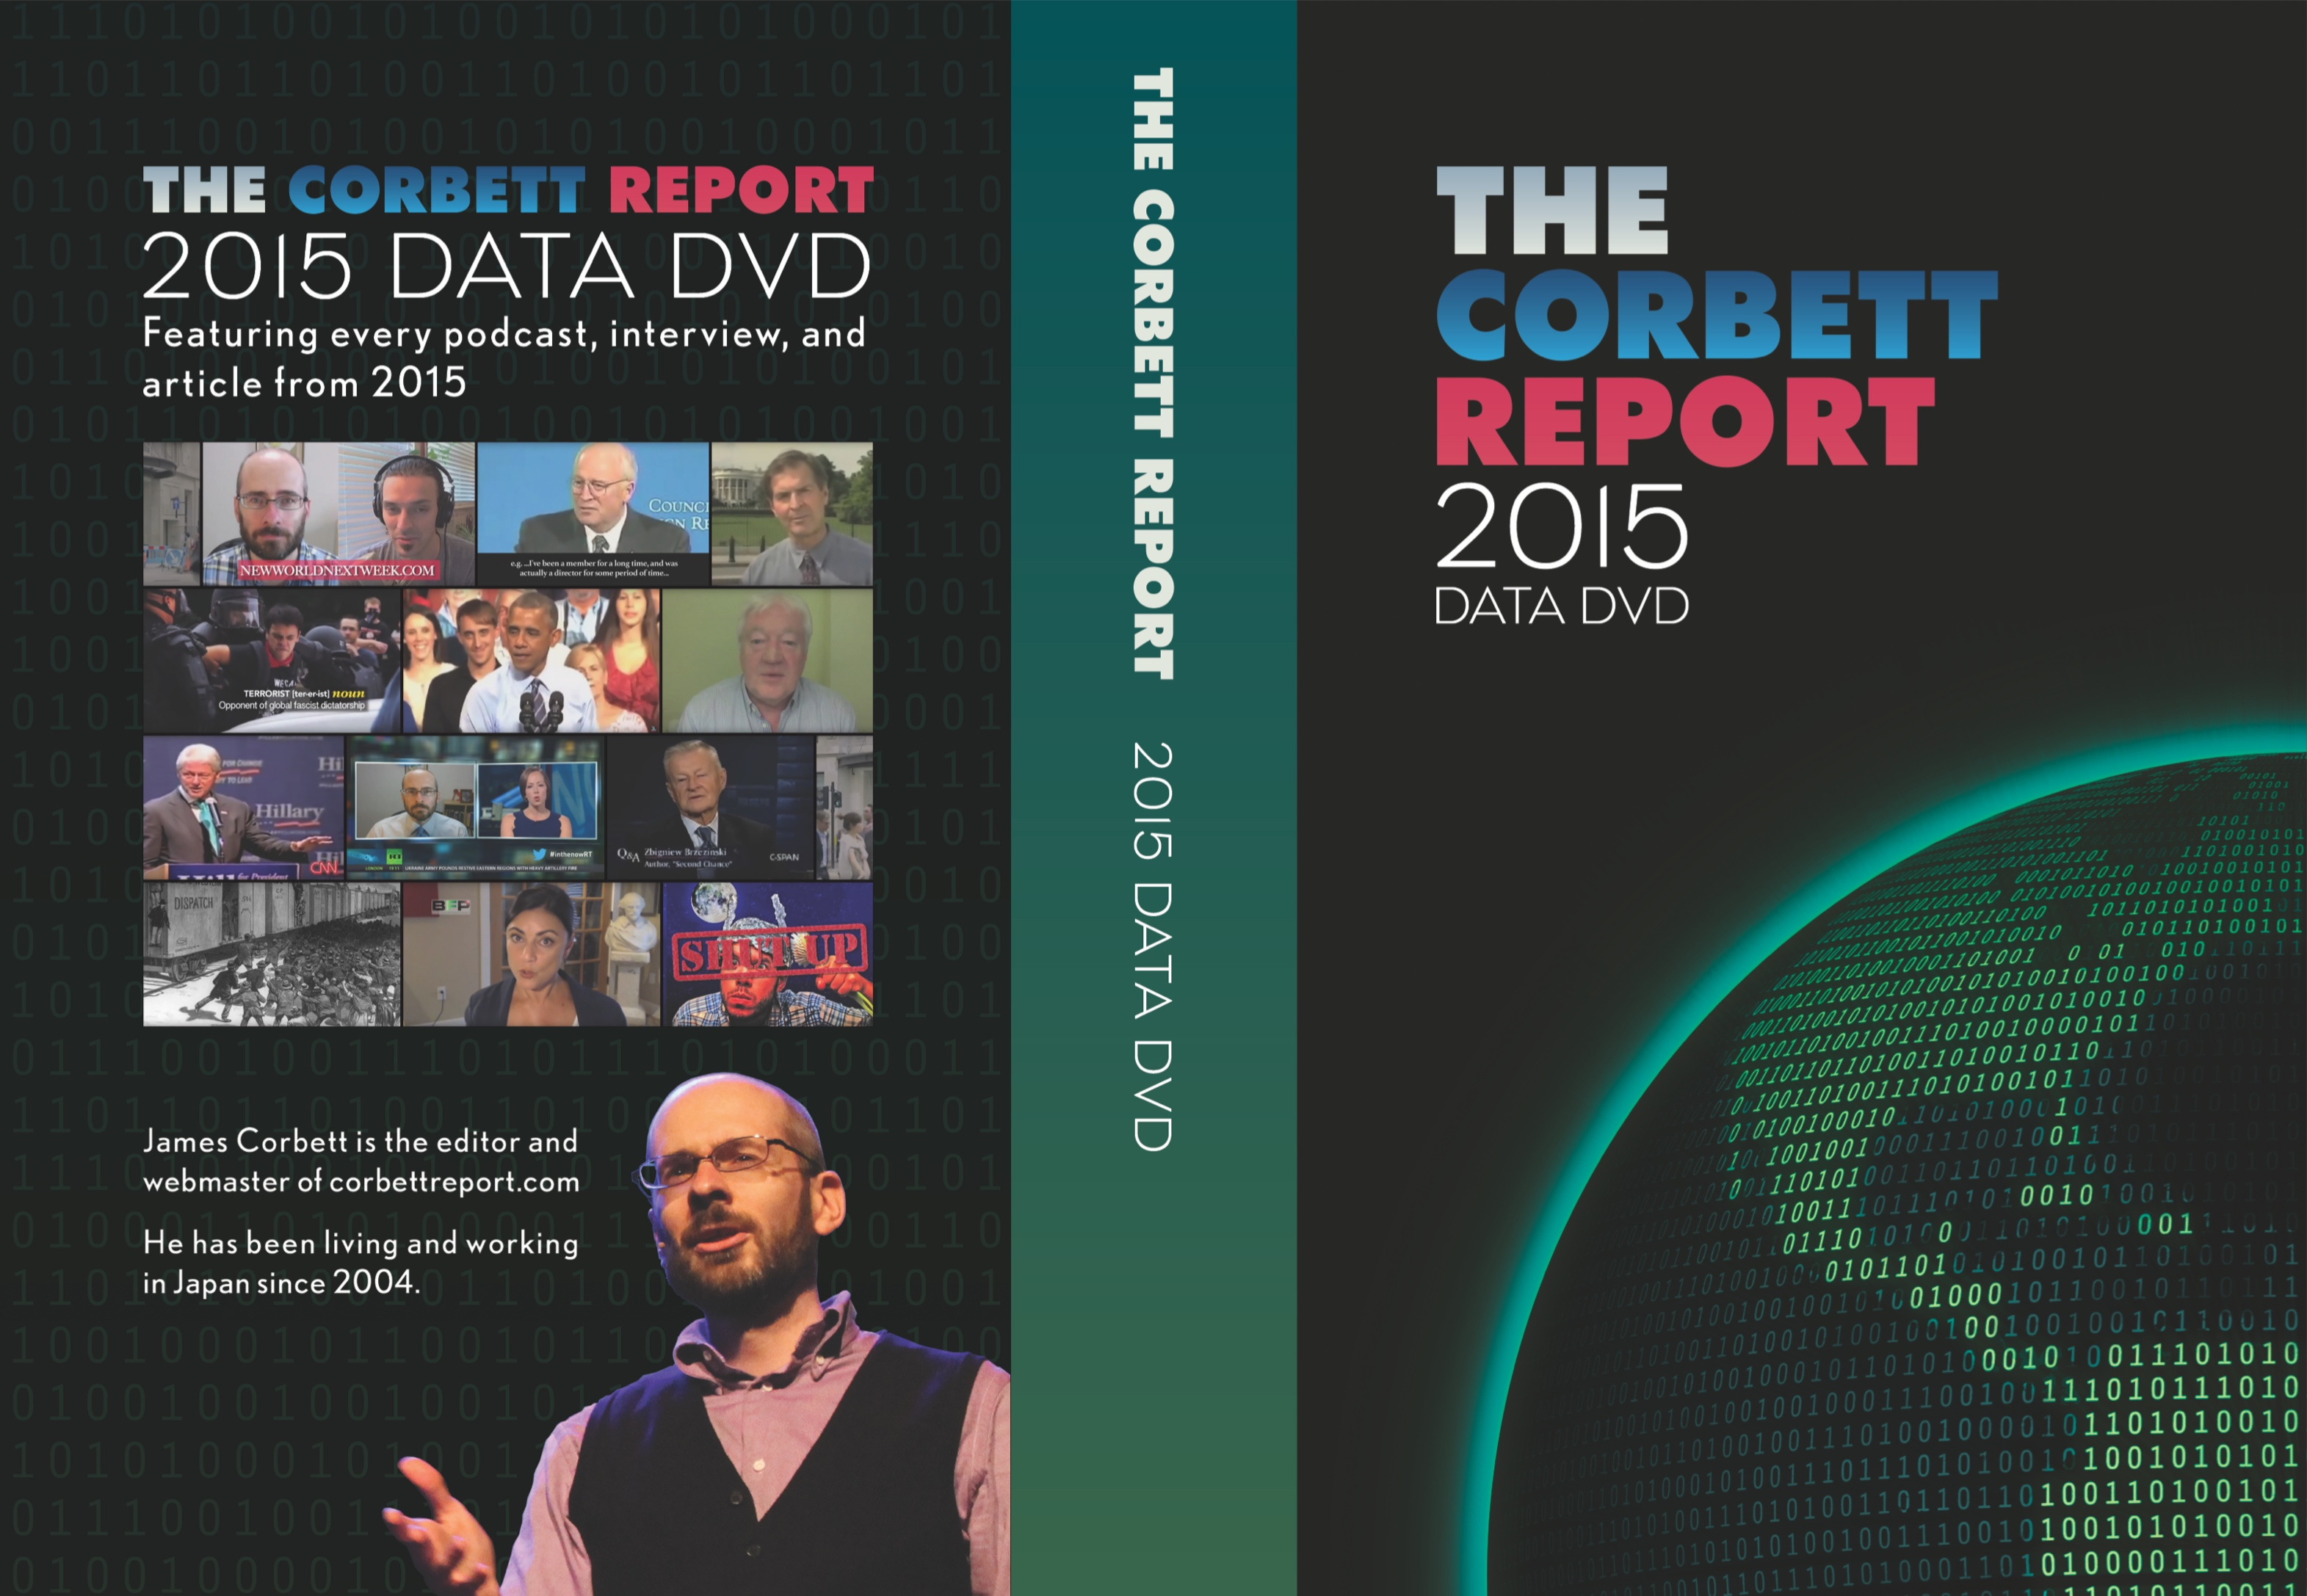 Data DVD 2015